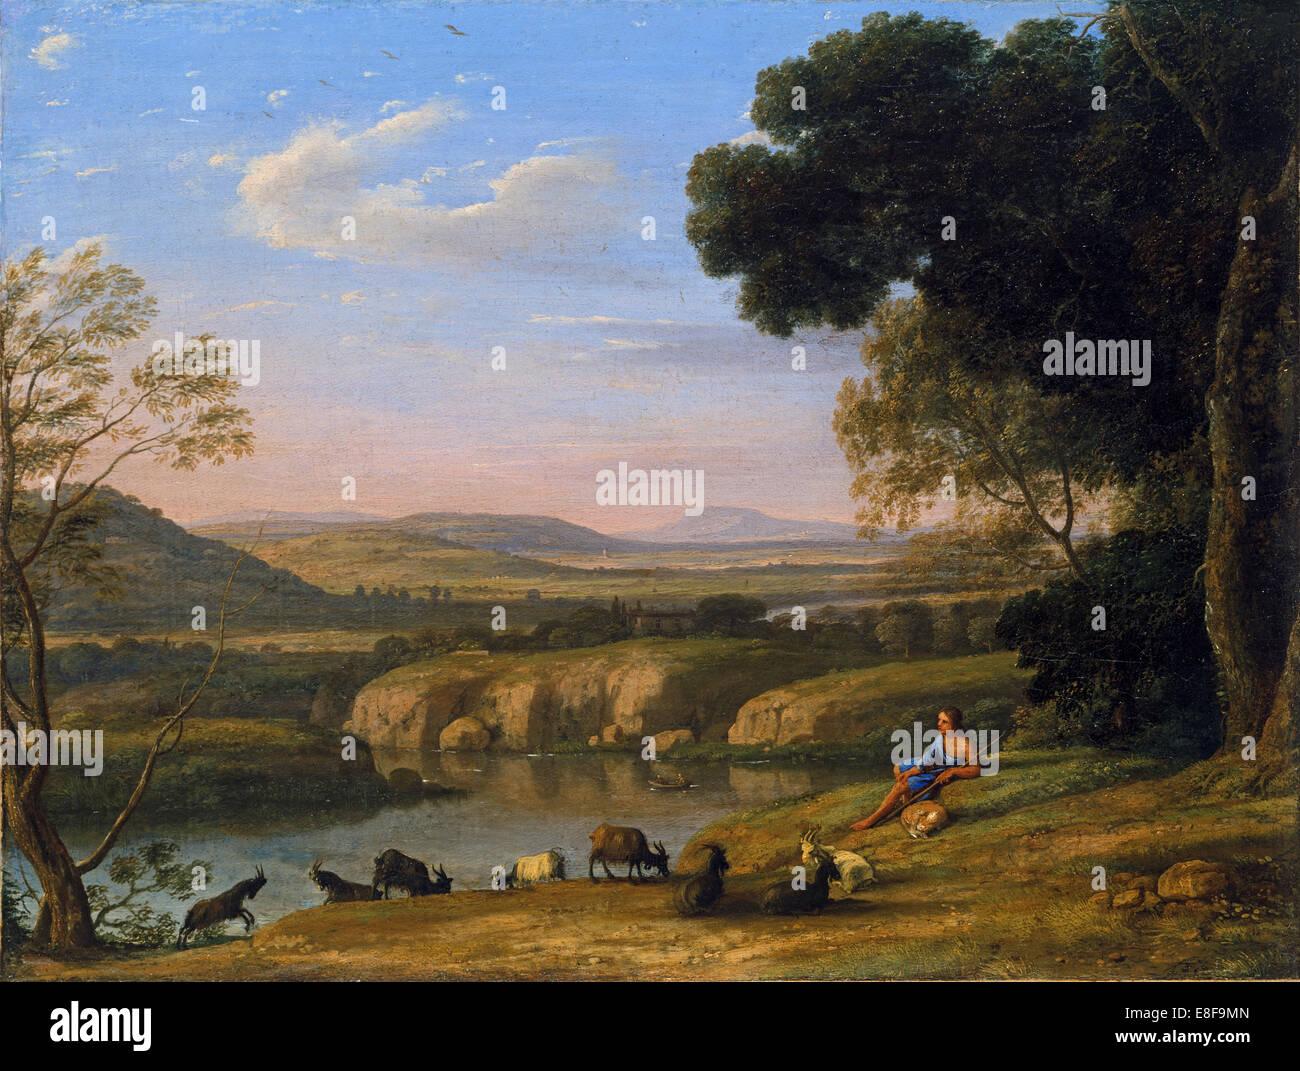 River landscape with Goatherd. Artist: Lorrain, Claude (1600-1682) - Stock Image